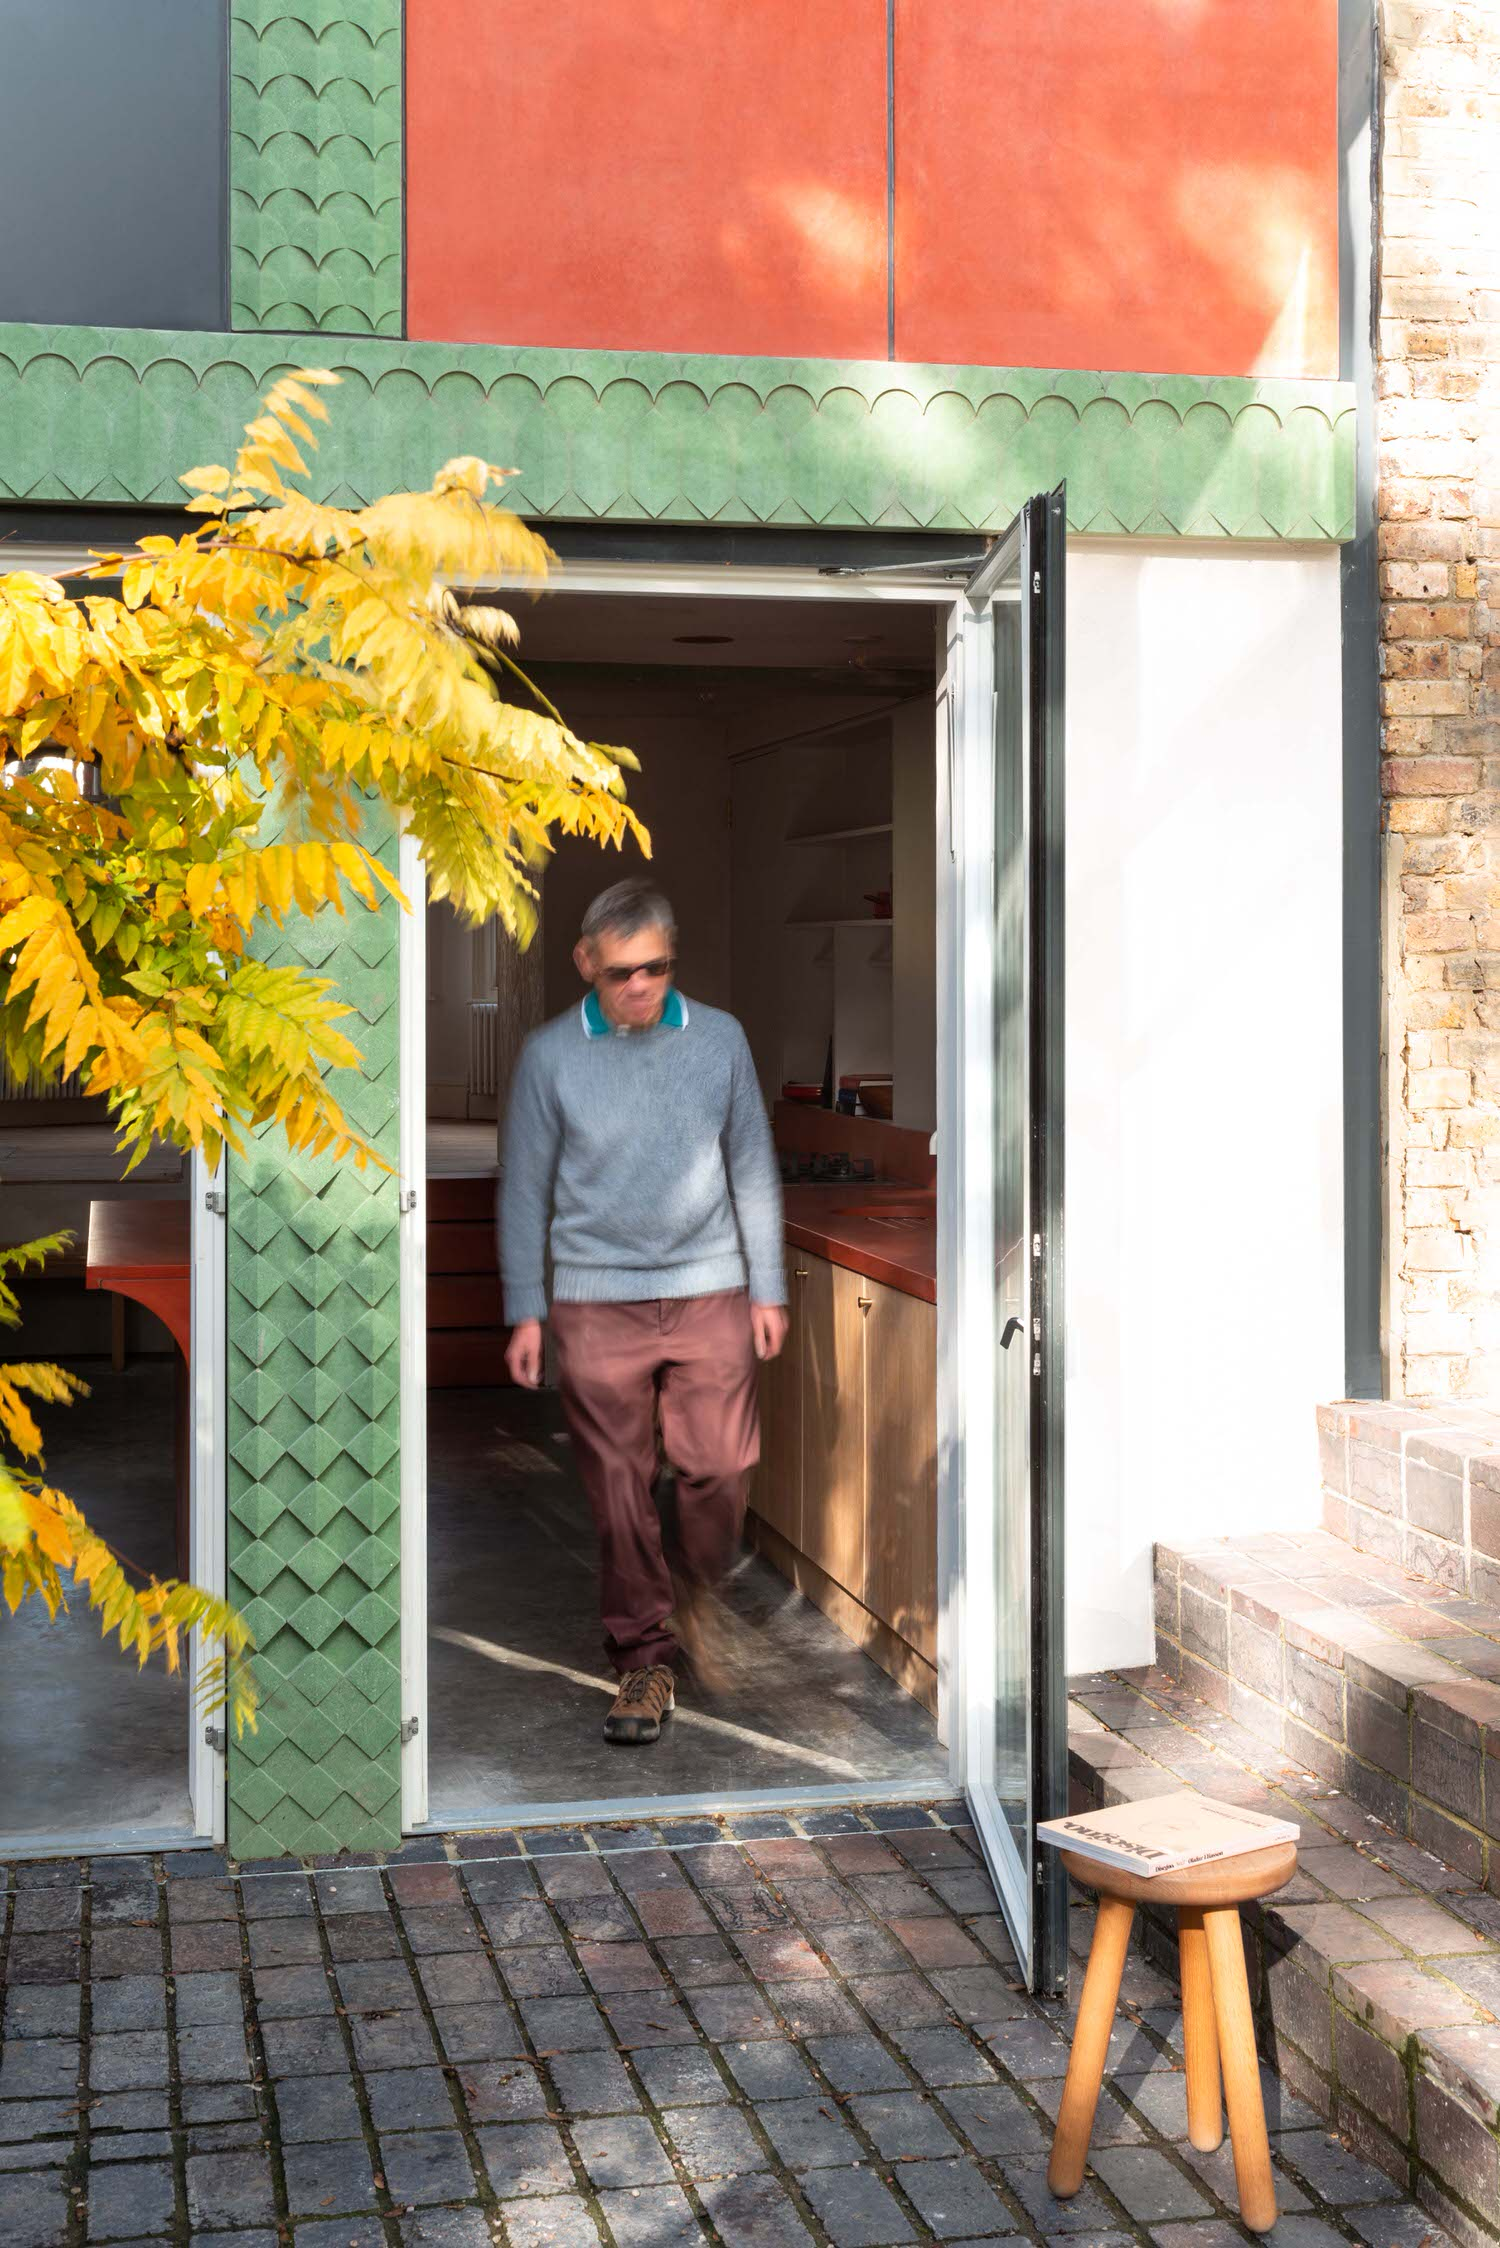 Studio Ben Allen House Recast London Residential Architecture Photo French+tye Yellowtrace 12